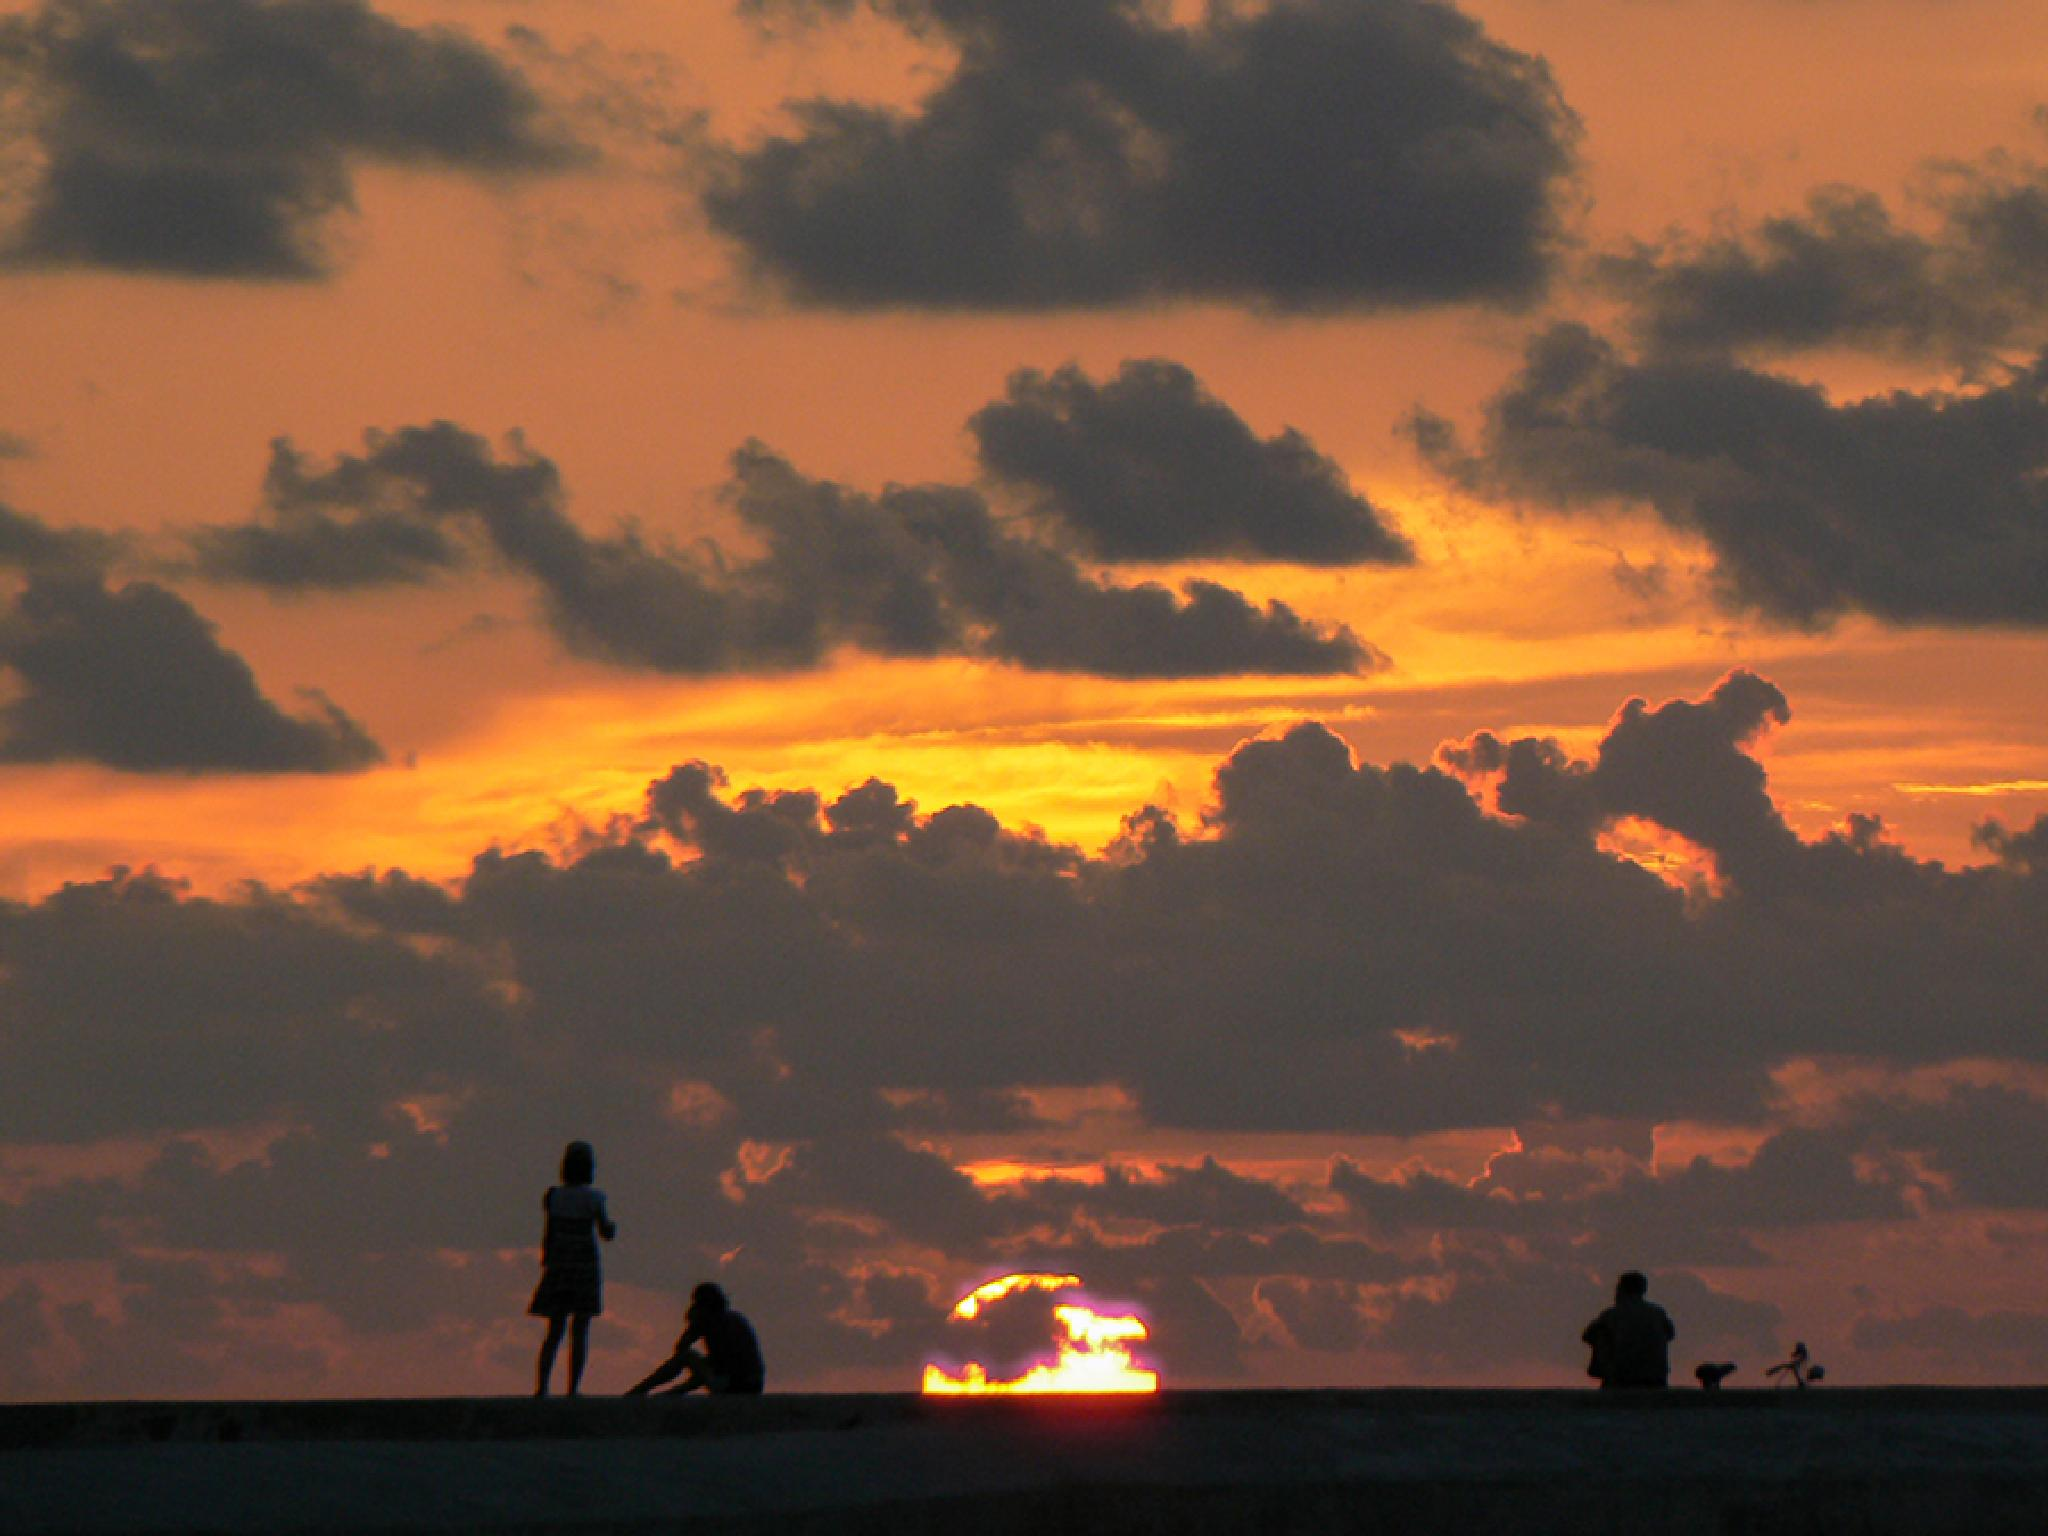 Sunset in Havana City by jackselyn